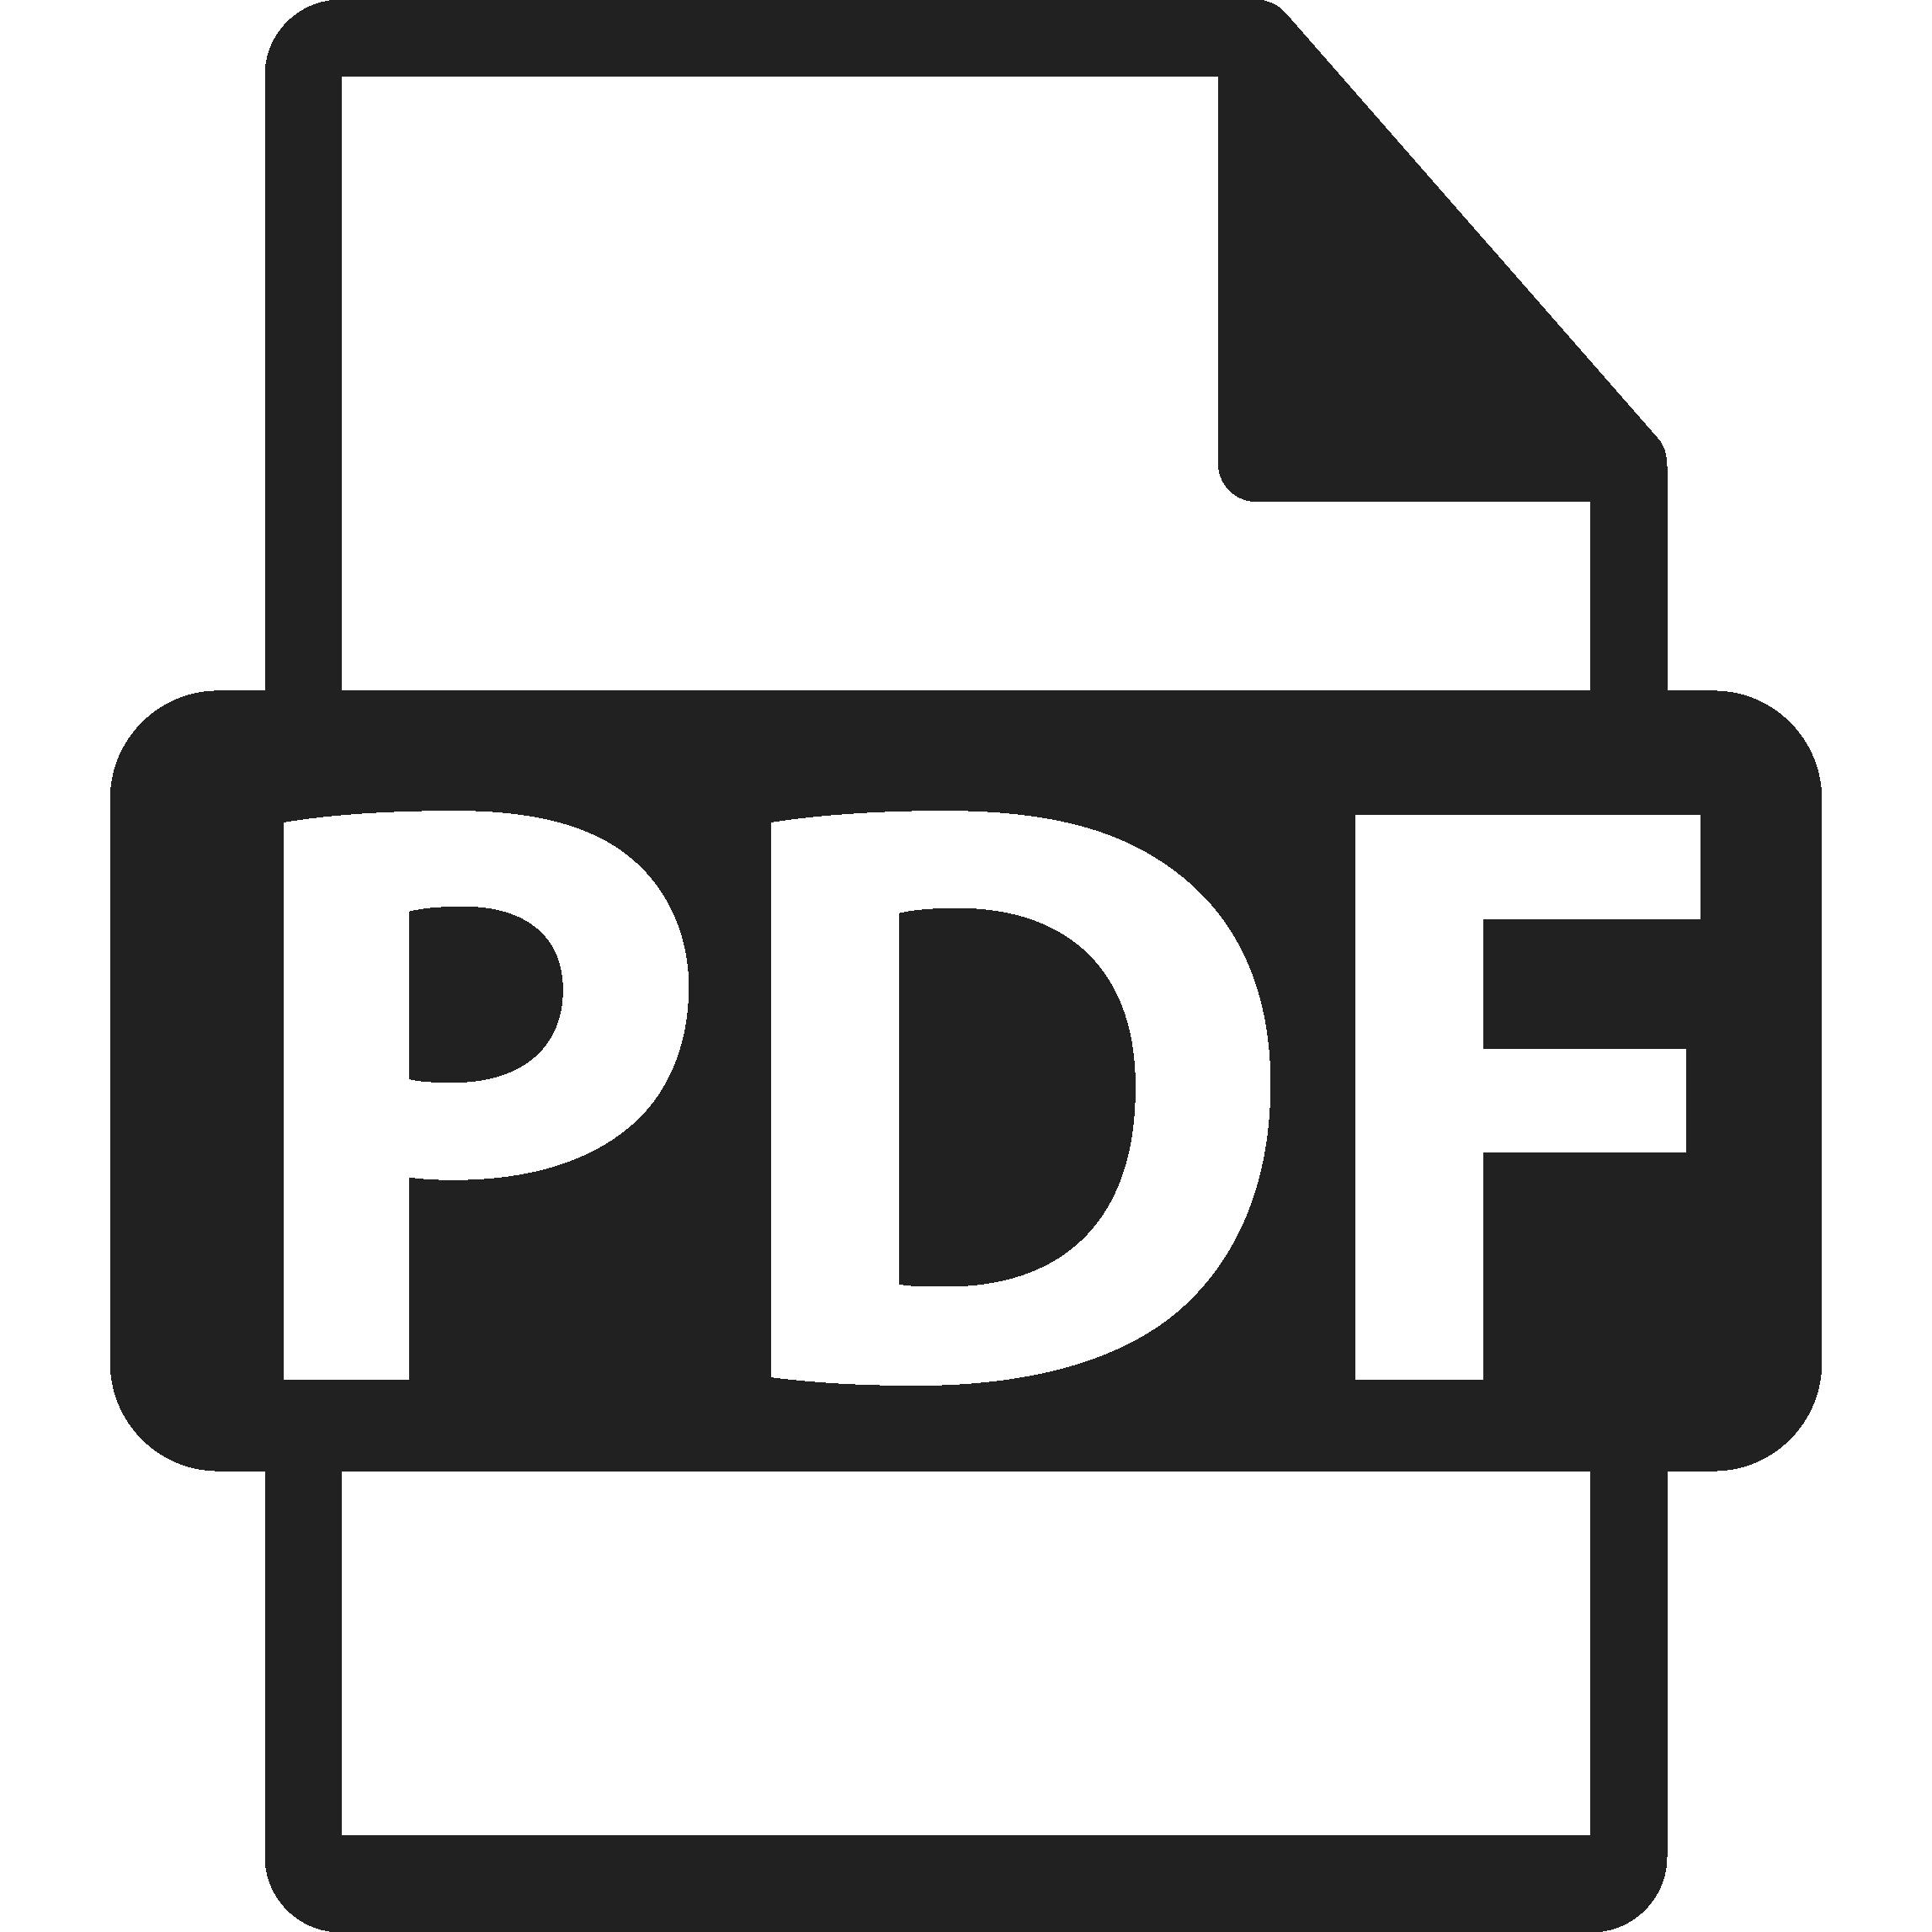 pdf Waibel, Jochen